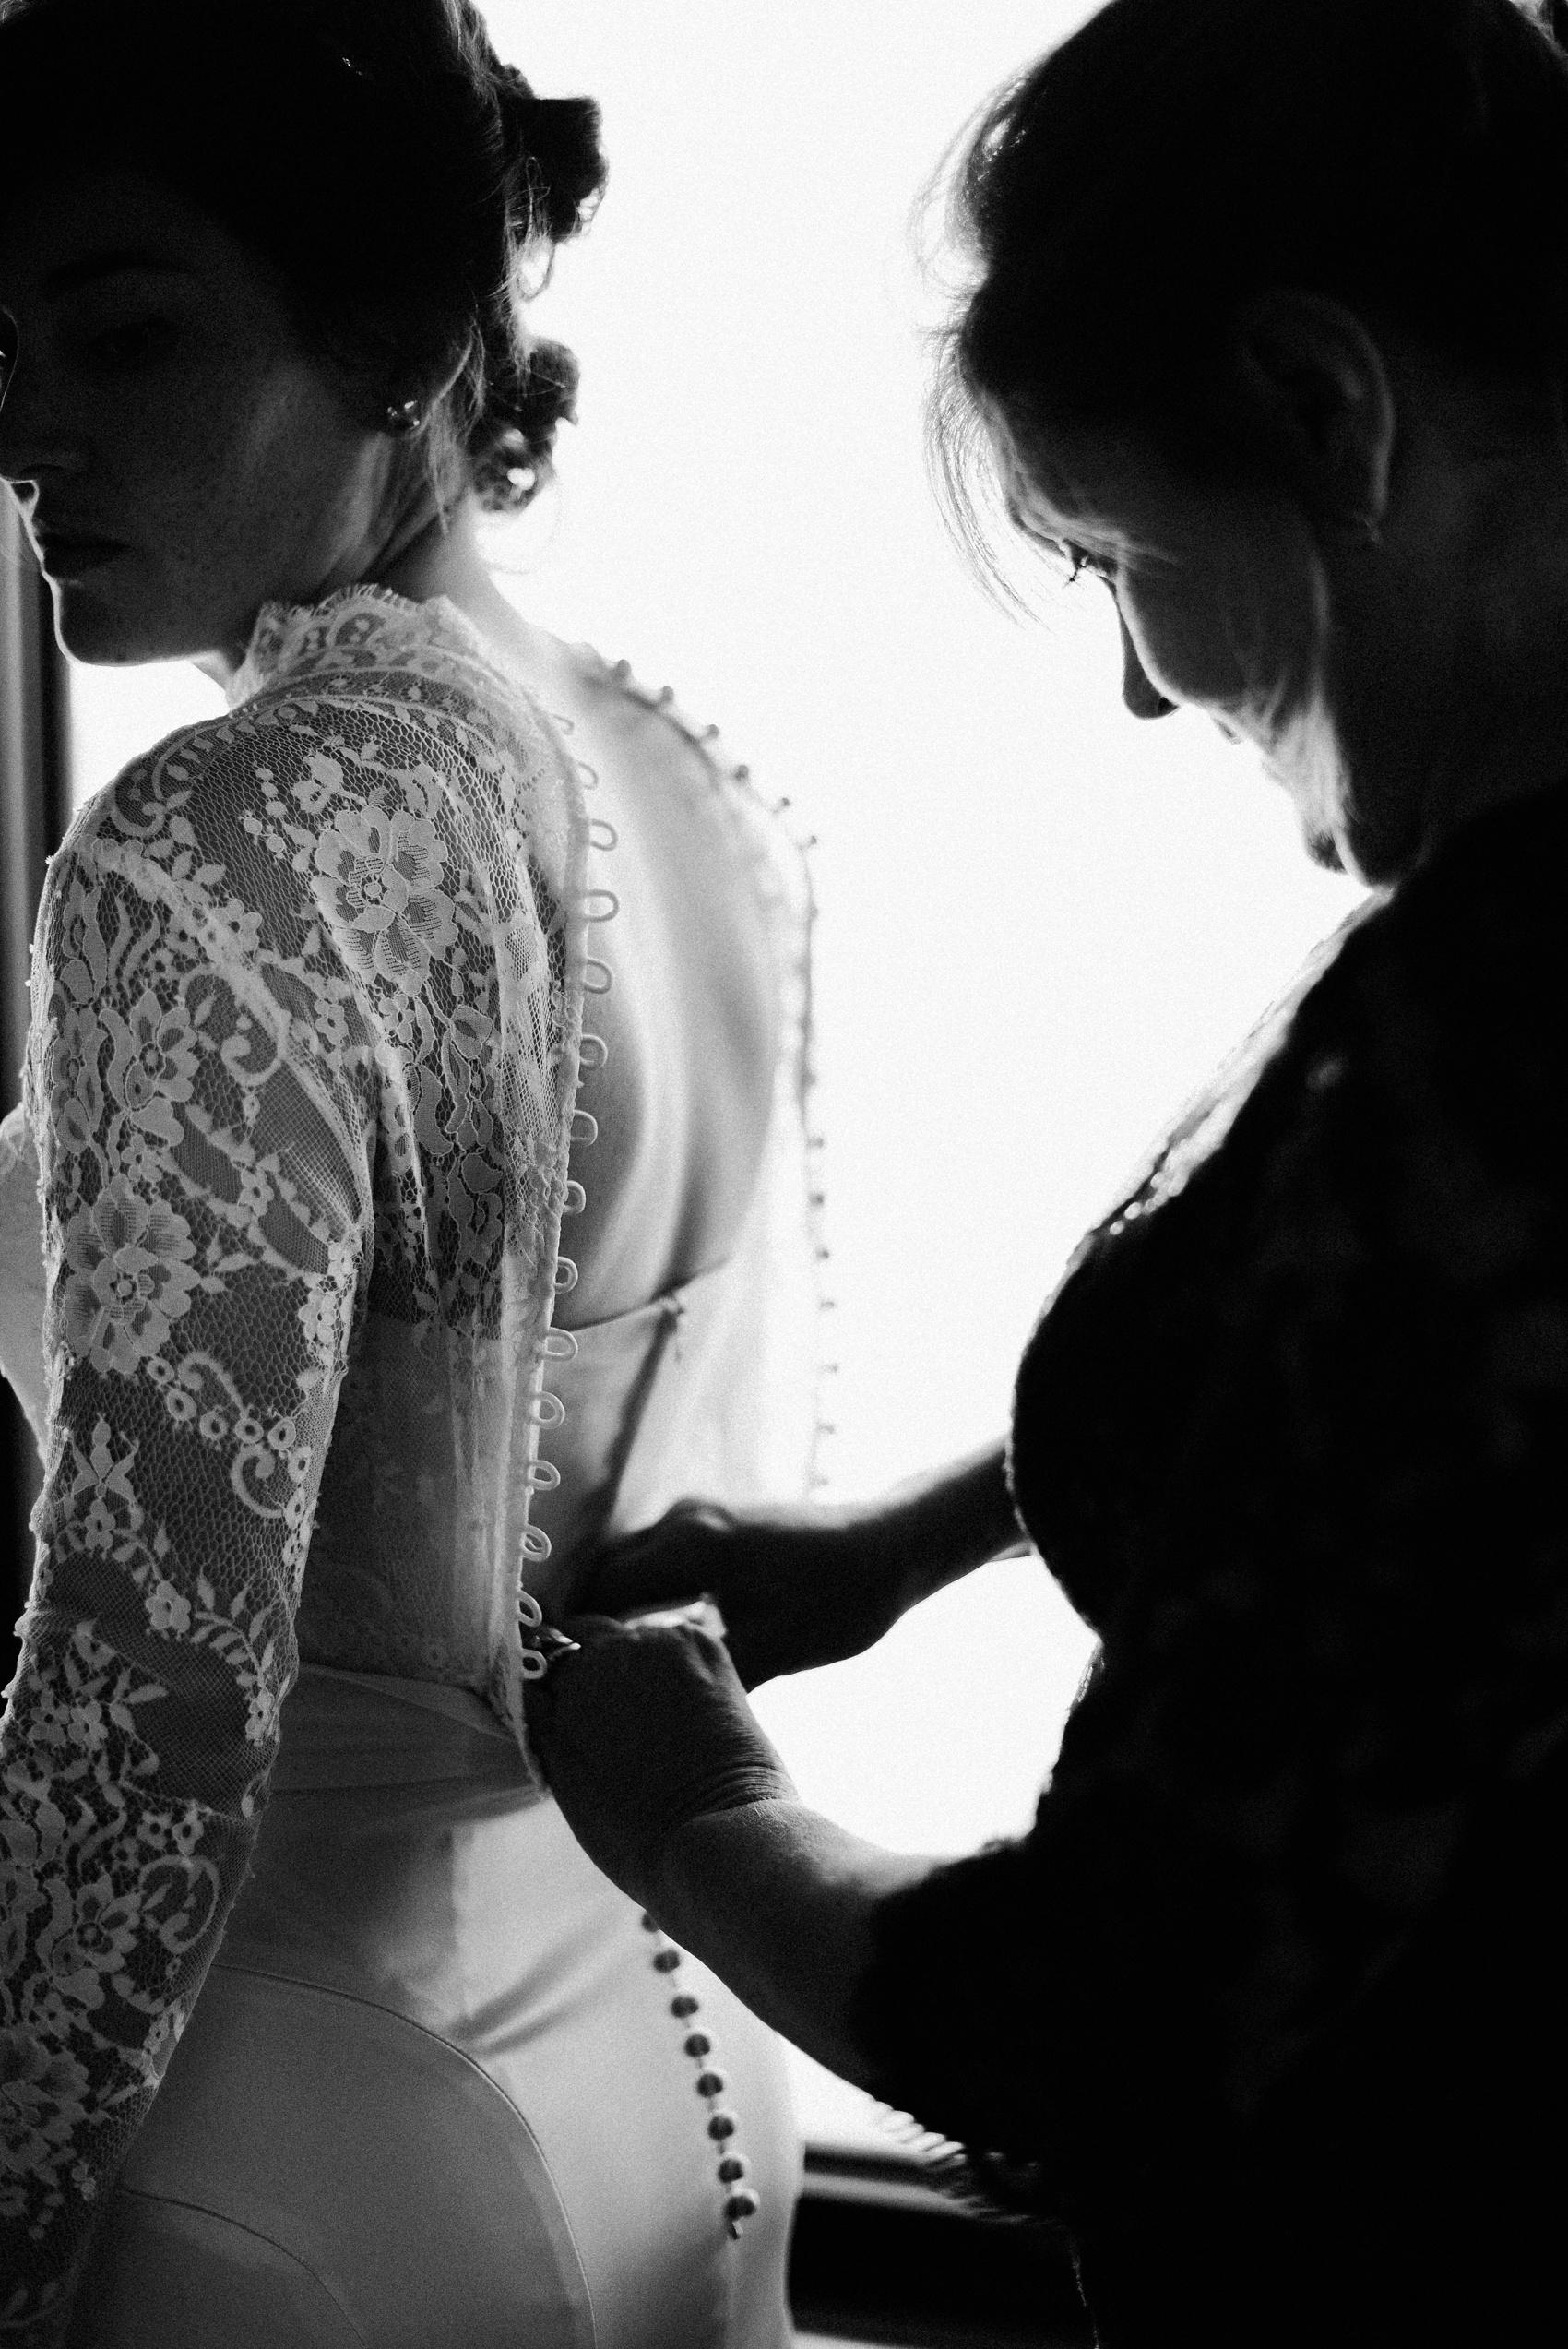 outerbanks_wedding_photographer_1253.jpg